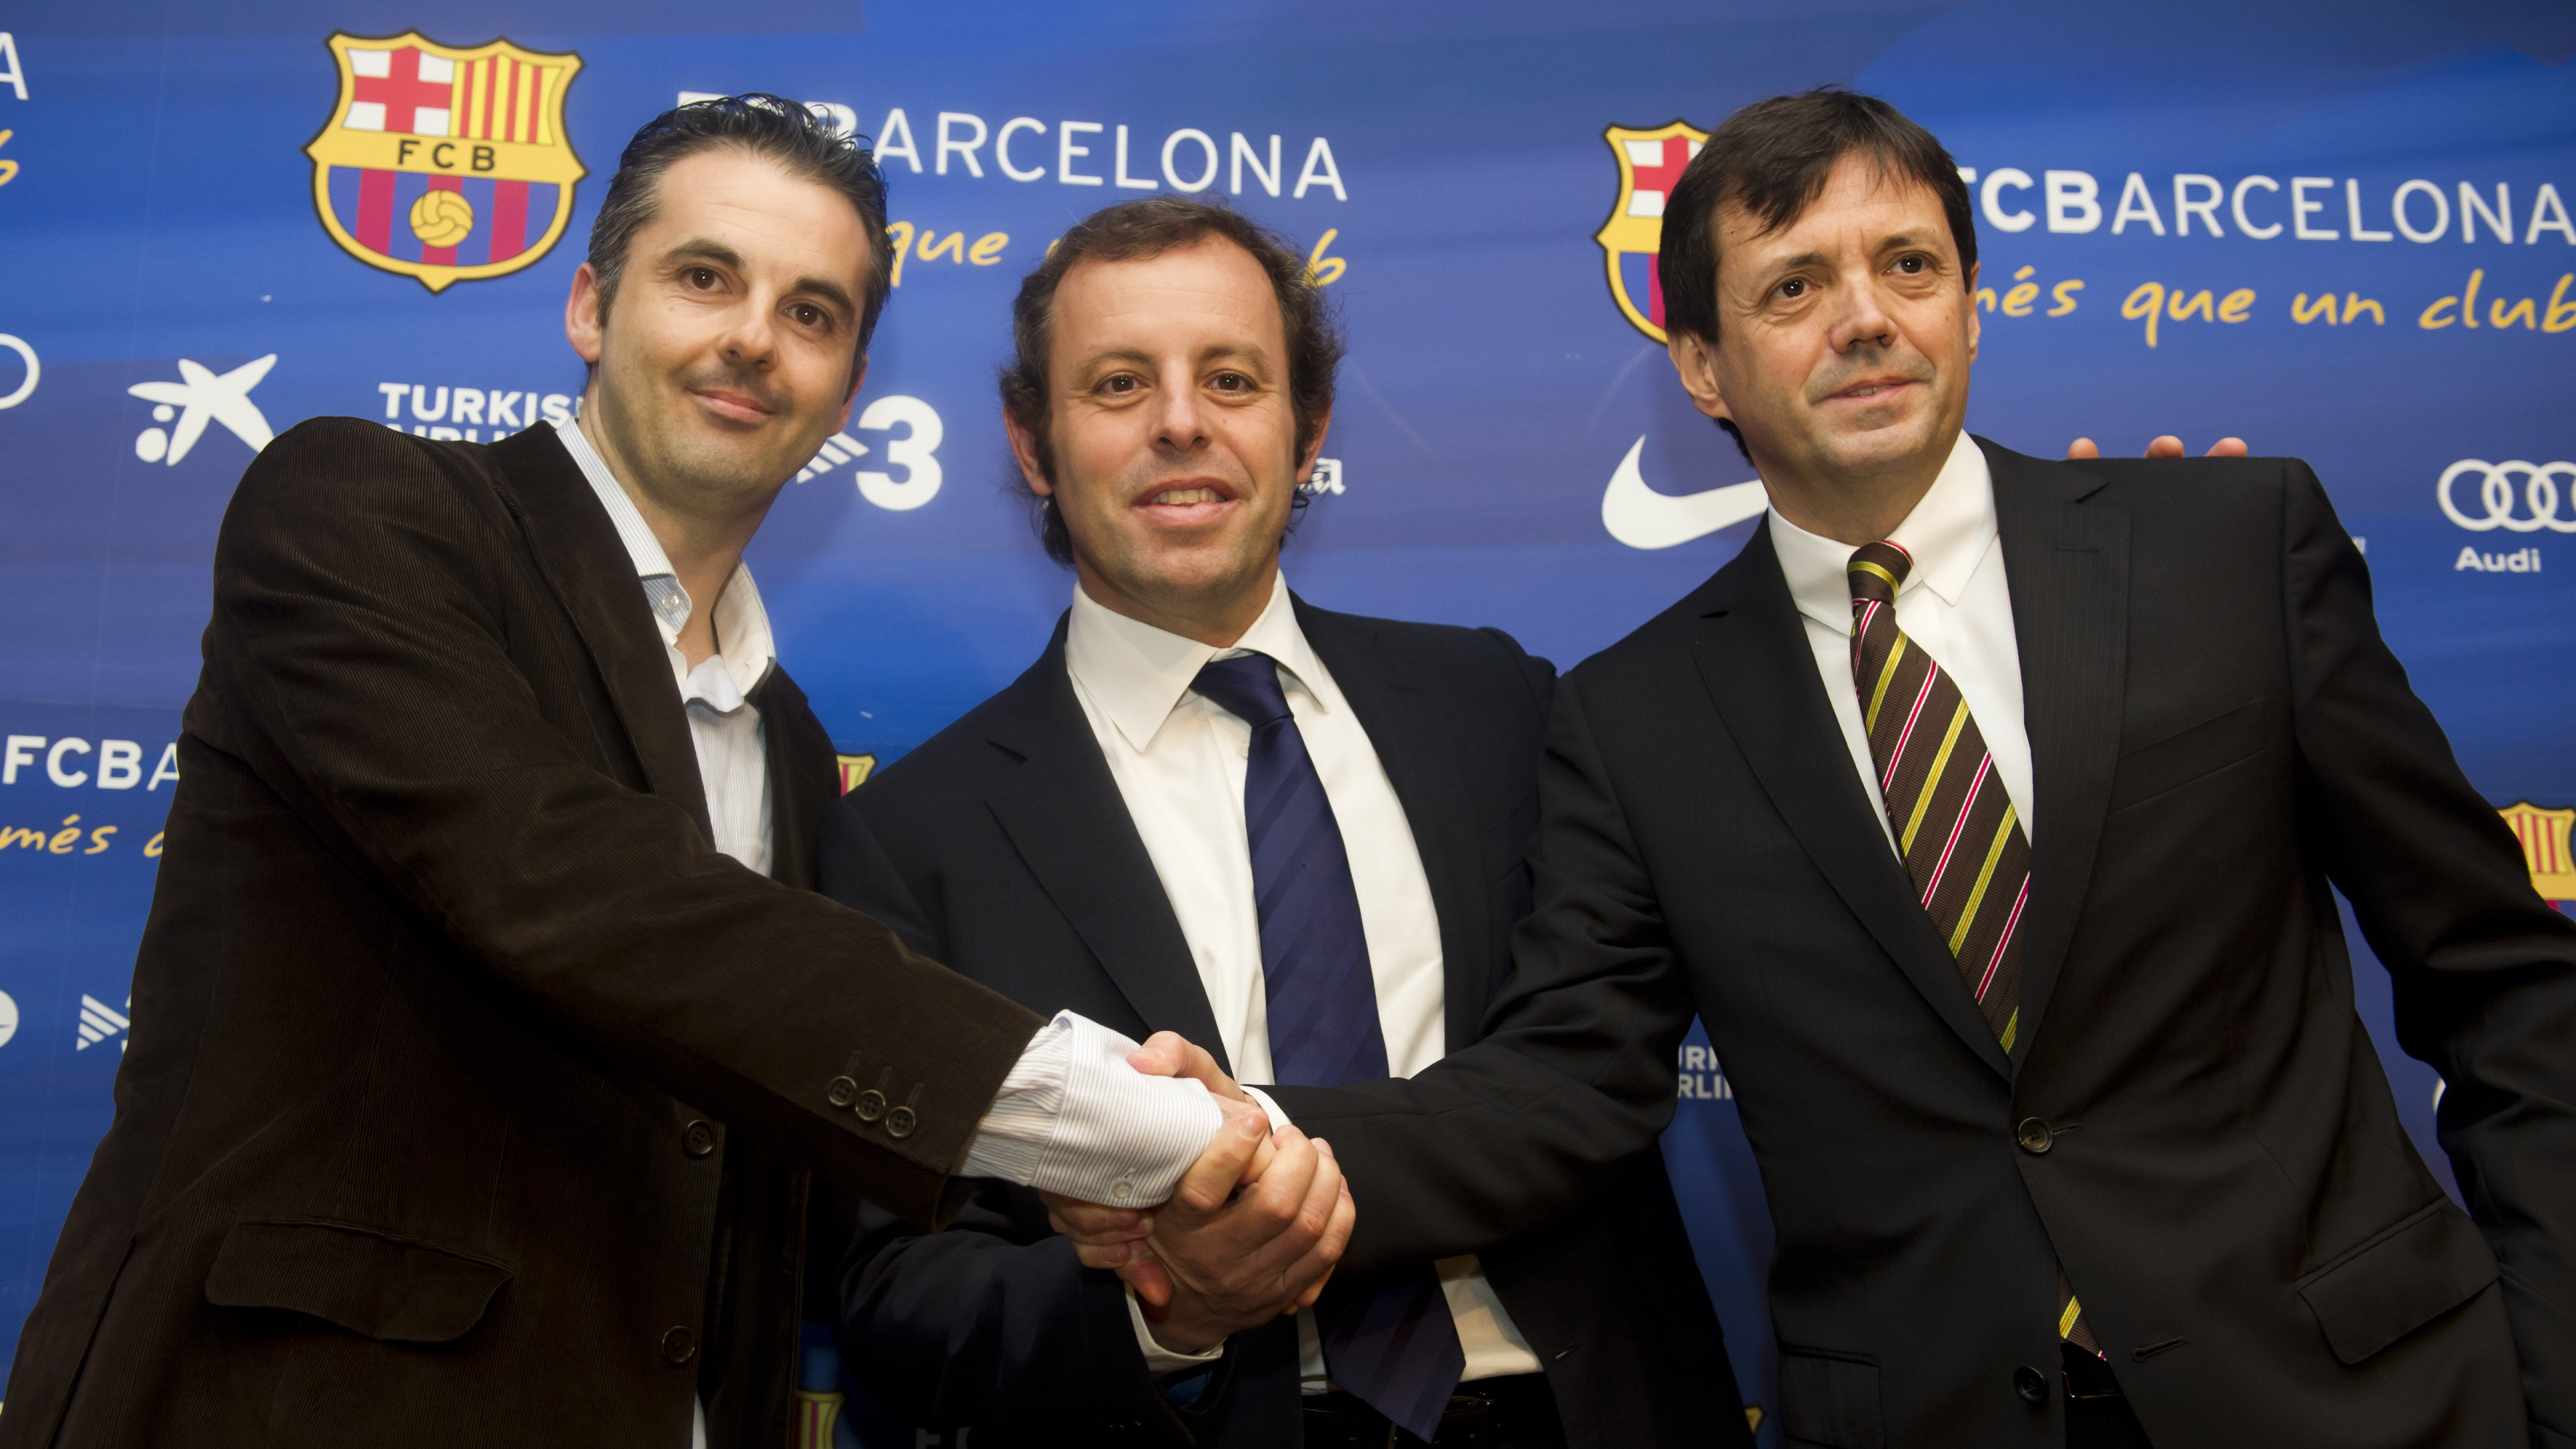 Imatge de Beto Borregán, Sandro Rosell i Ramon Cierco